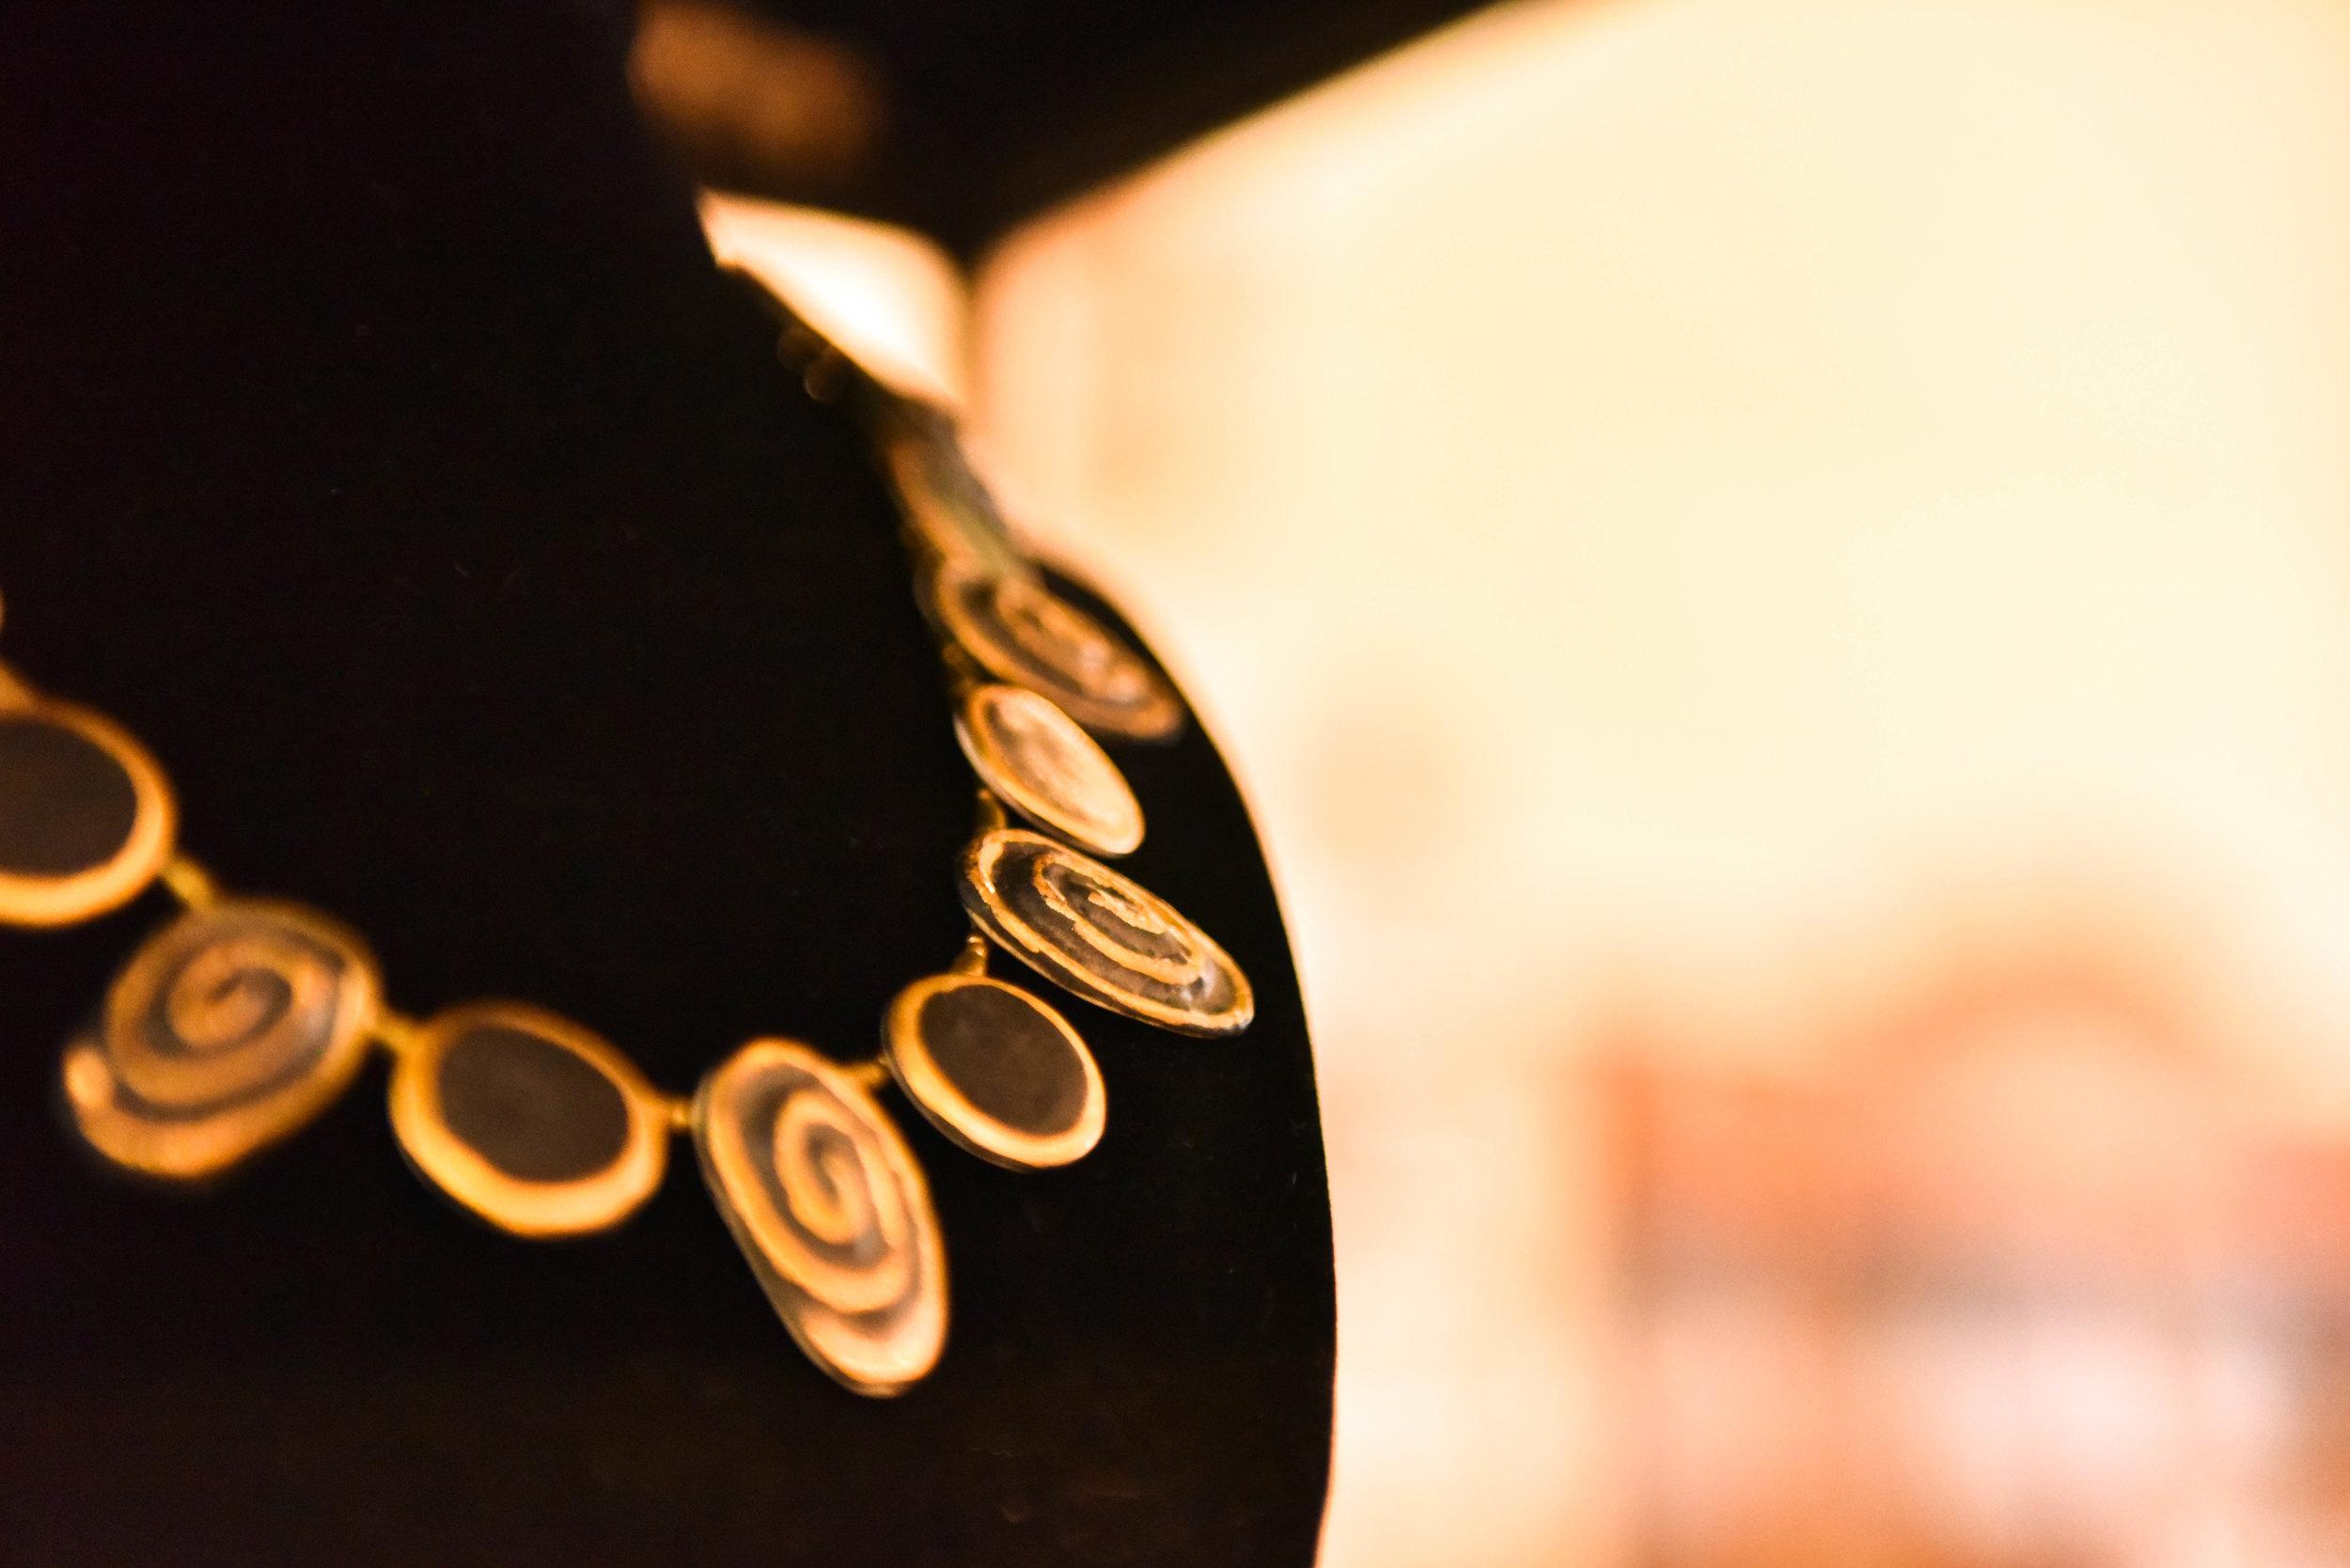 Eicke Schmidt jewellery